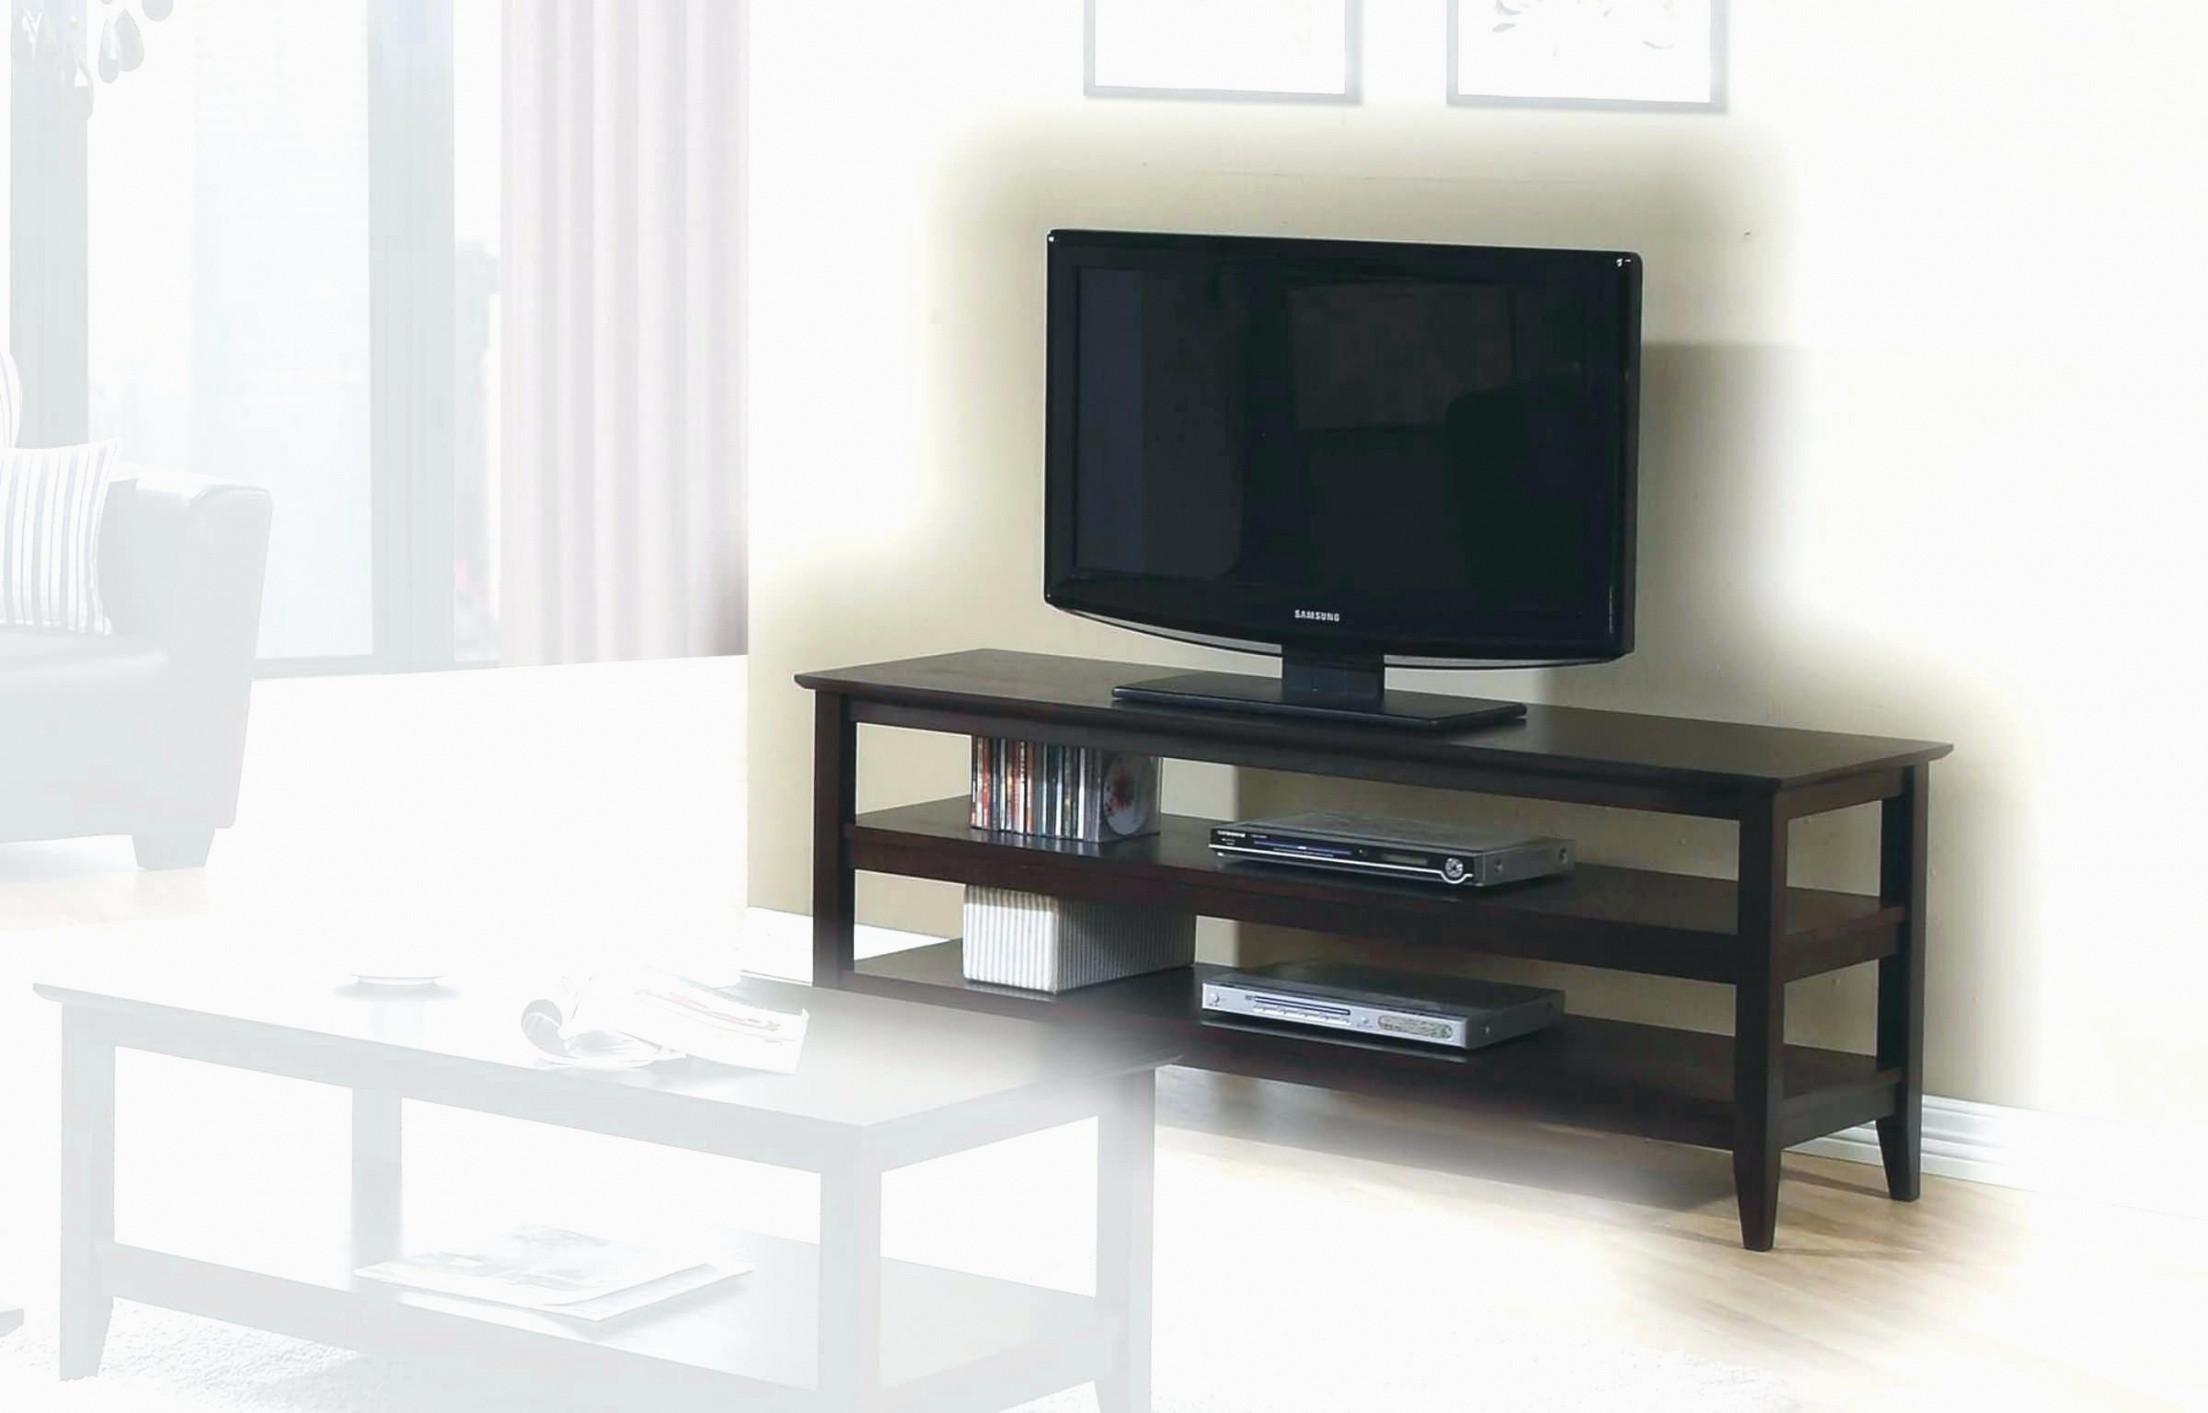 cdiscount meuble tele meuble tv cdiscount rpc meuble tv blanc rpclefilm of cdiscount meuble tele